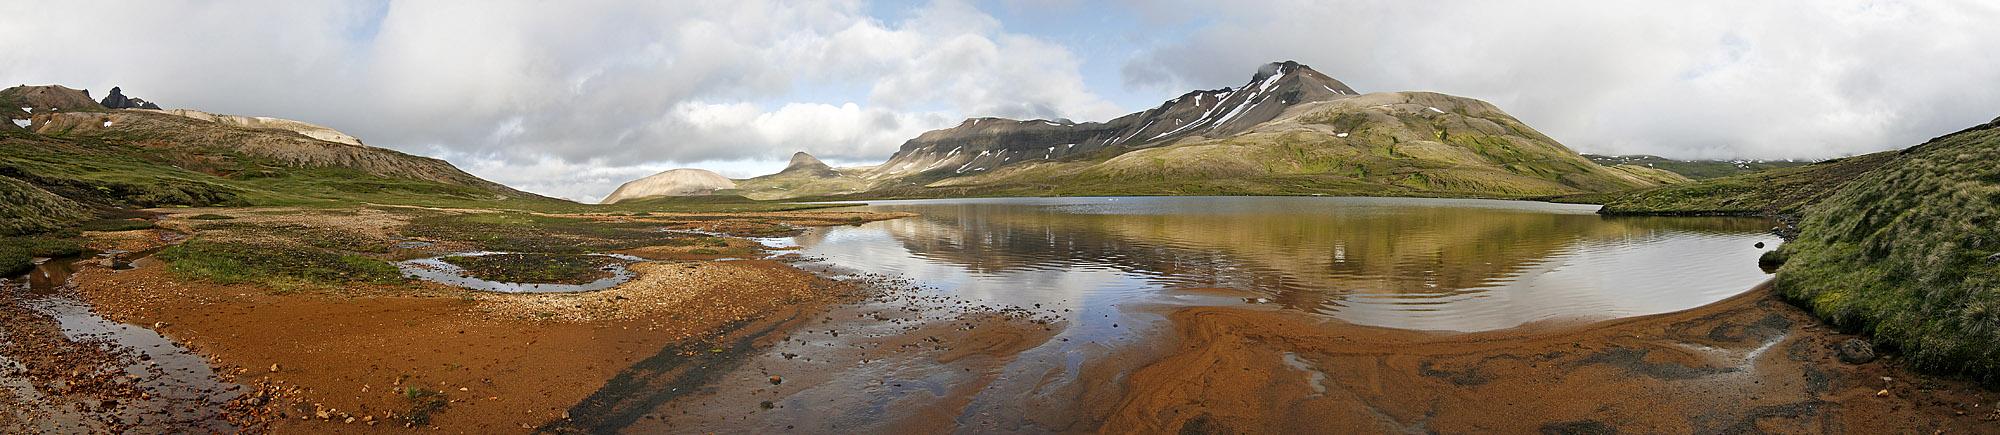 Menschenleere in Island